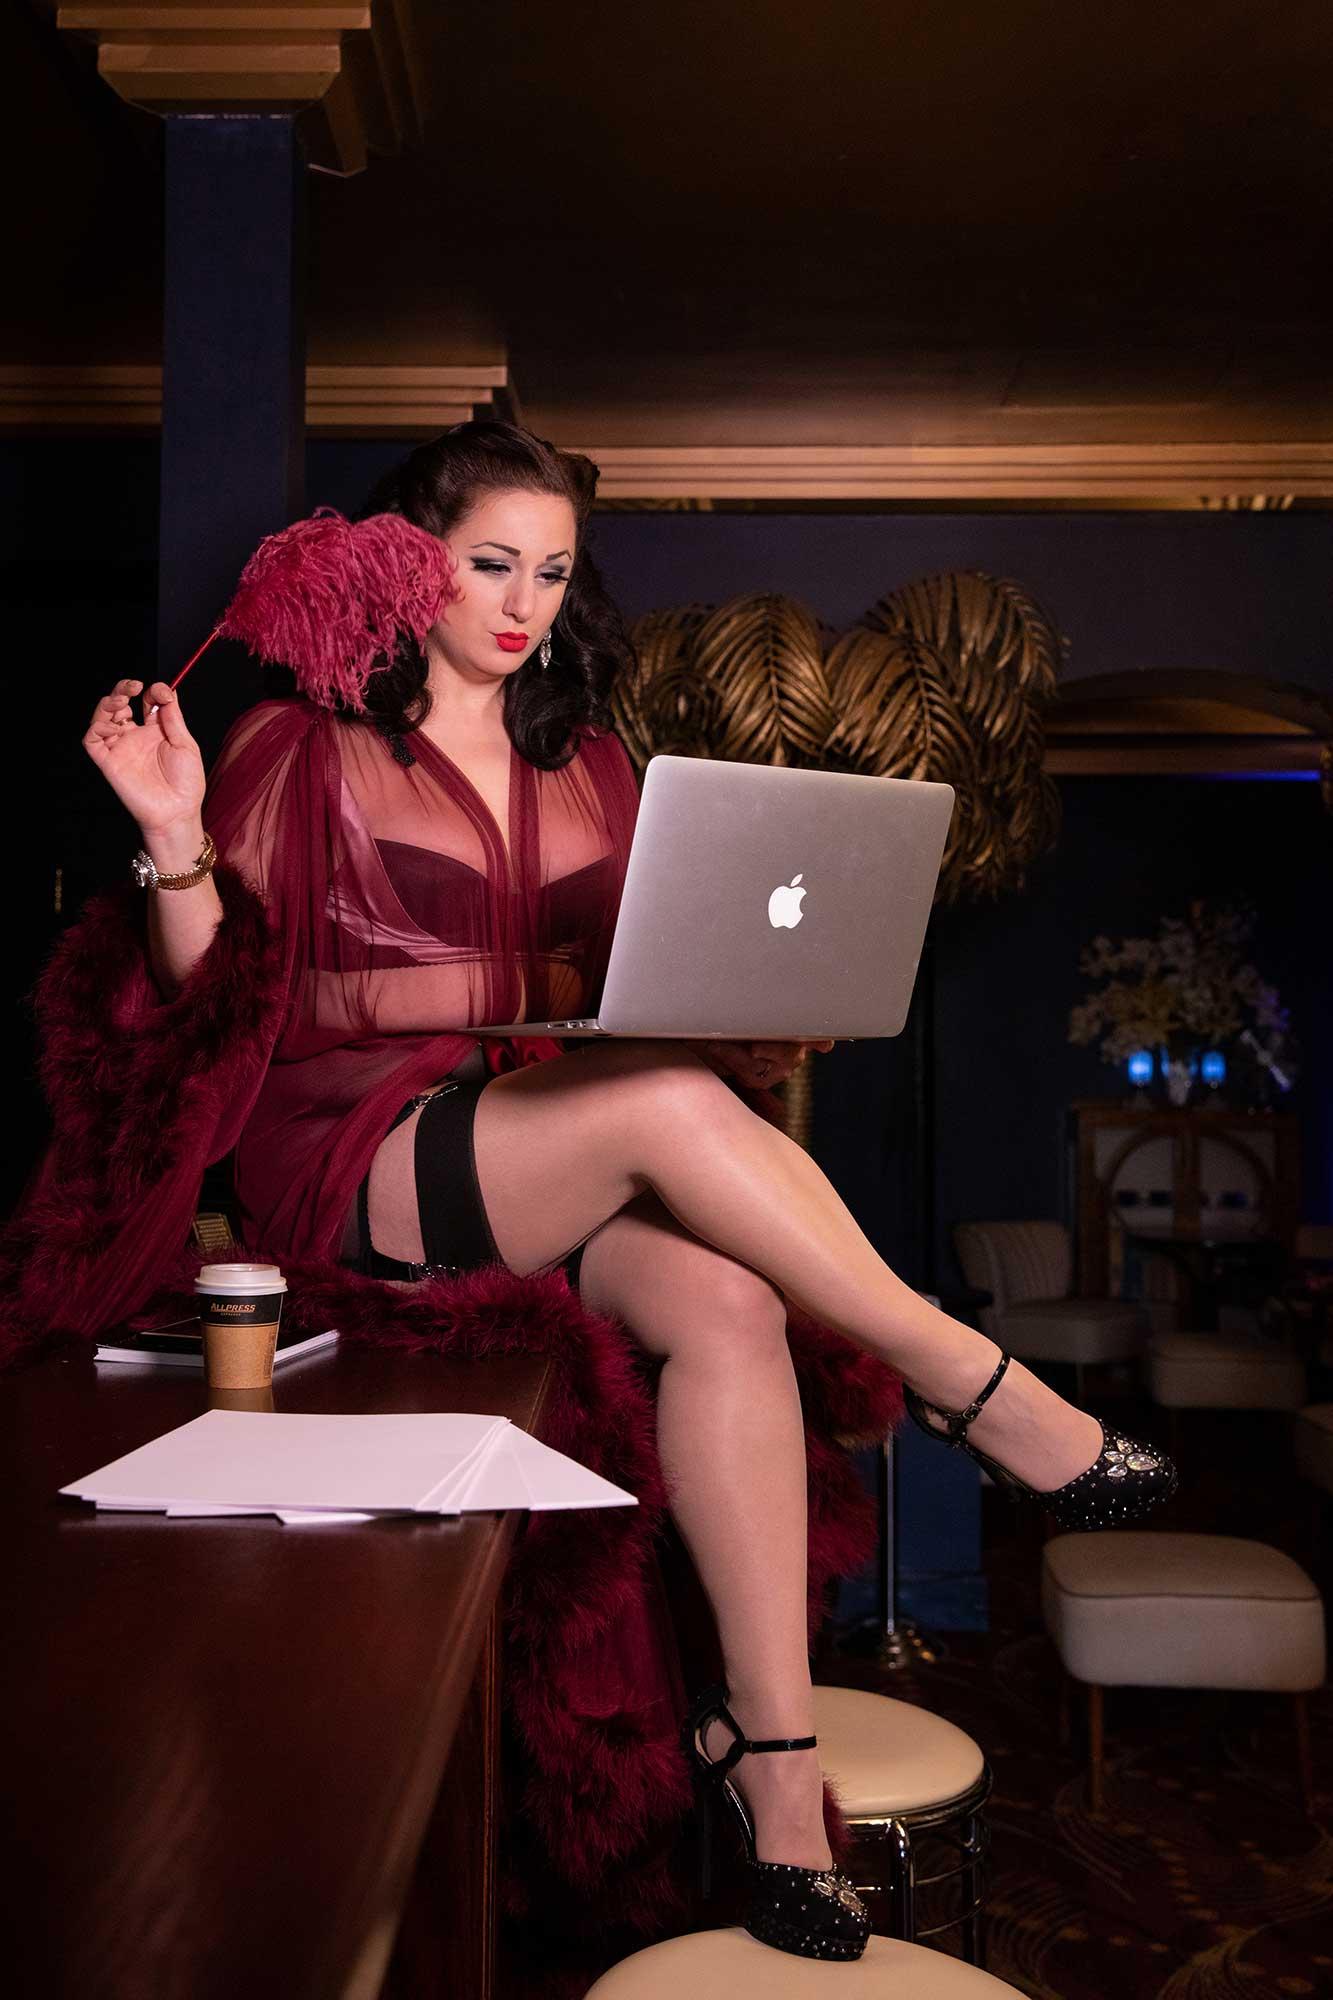 House Of Burlesque Branding Photoshoot by Hertfordshire Branding Photographer Tigz Rice Ltd 2021. http://www.tigzrice.com